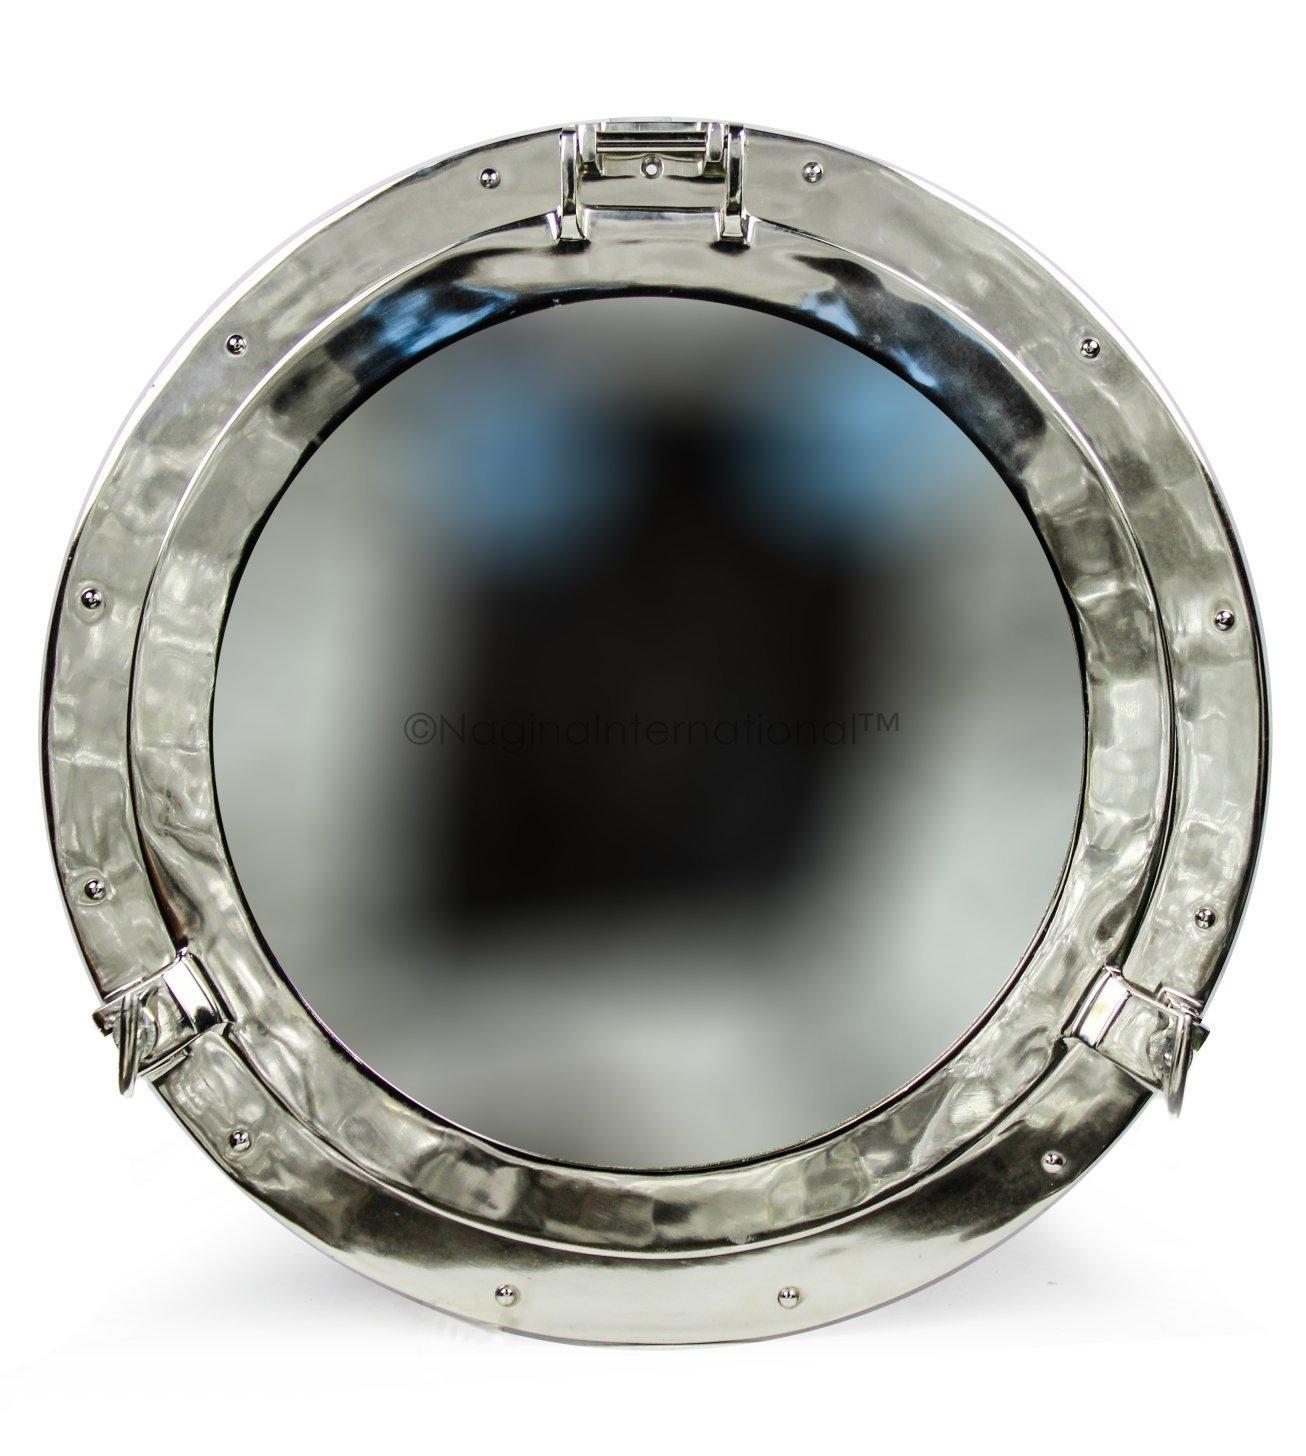 Large Beautiful Silver Metal Mirror | Nickel Aluminum Porthole Wall Hanging Mirror | Nautical Pirate's Antique Decor | Maritime Gifts | Nagina International (18 Inches)